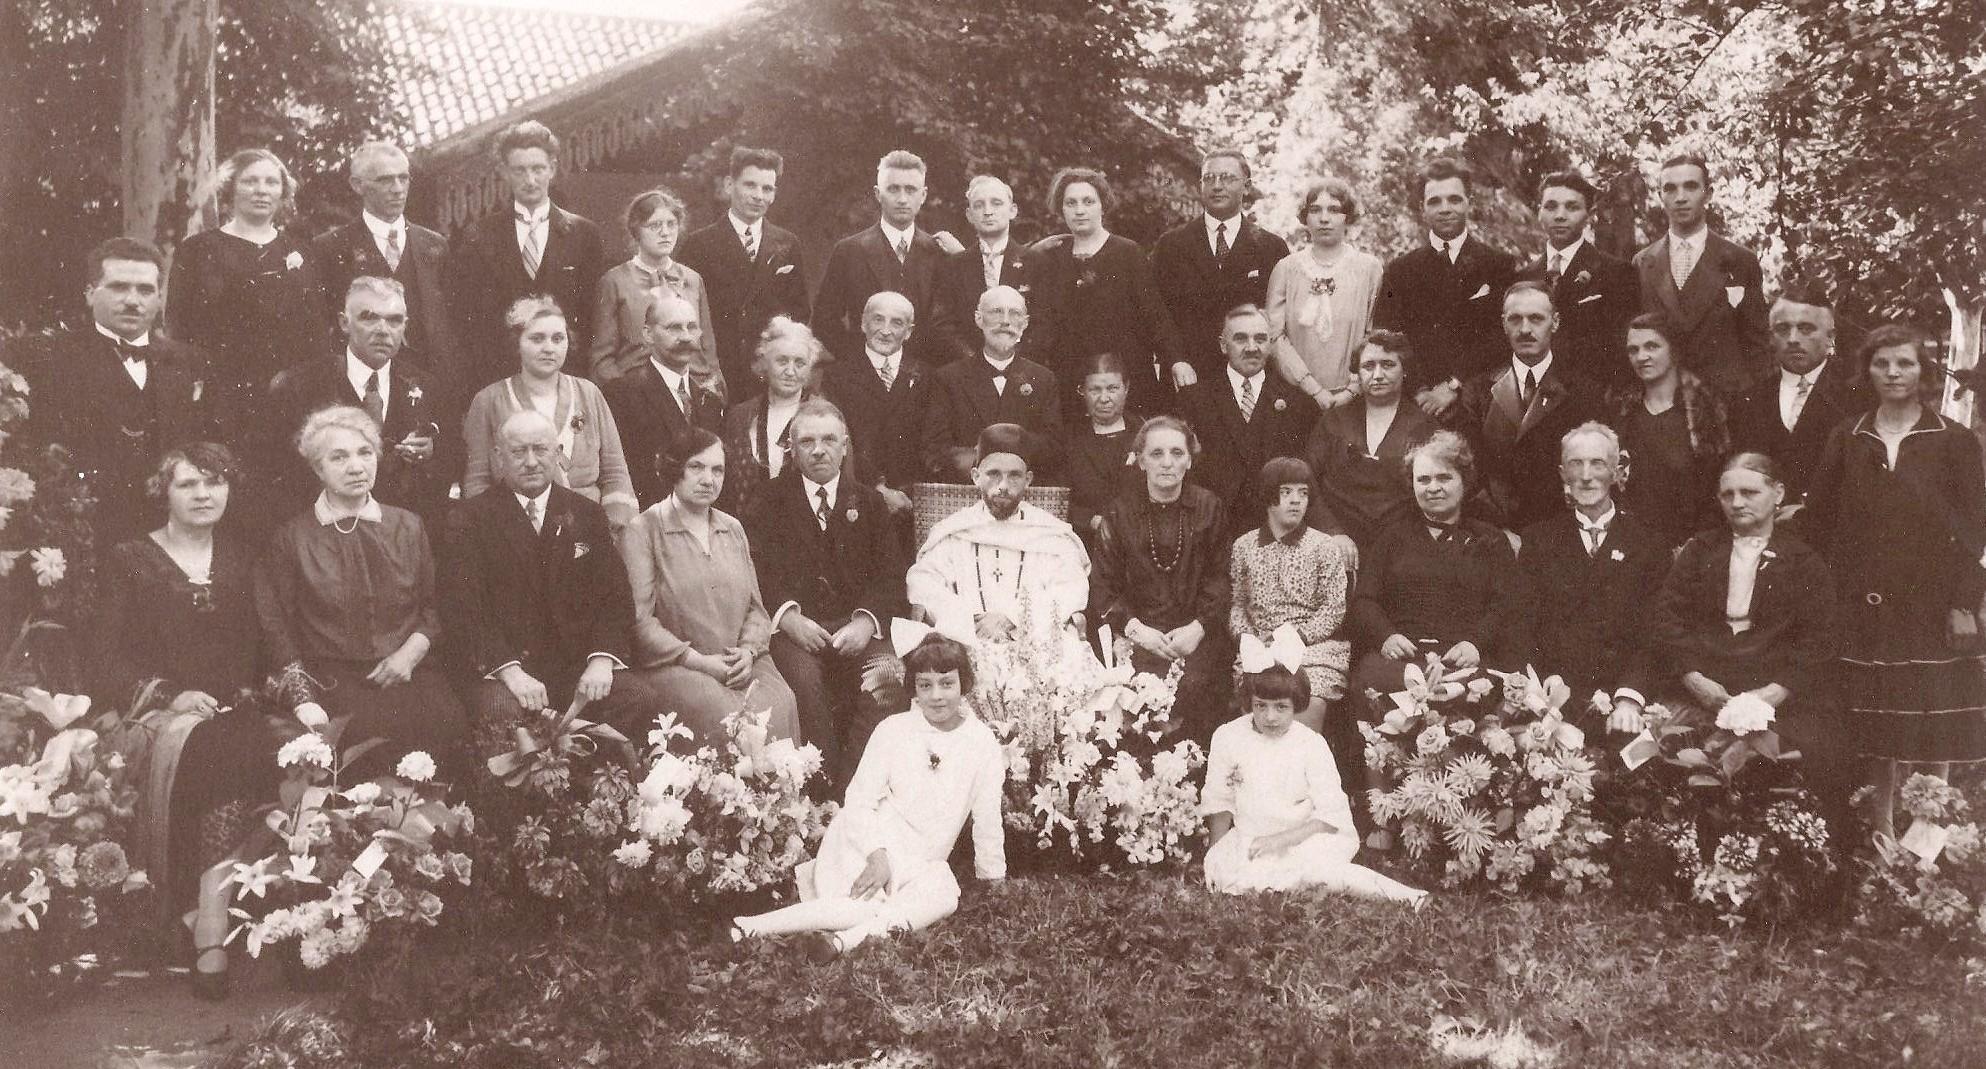 Familiefoto na de eerste heilige mis van Frits Neomagus in 1929 in Oosterhout.